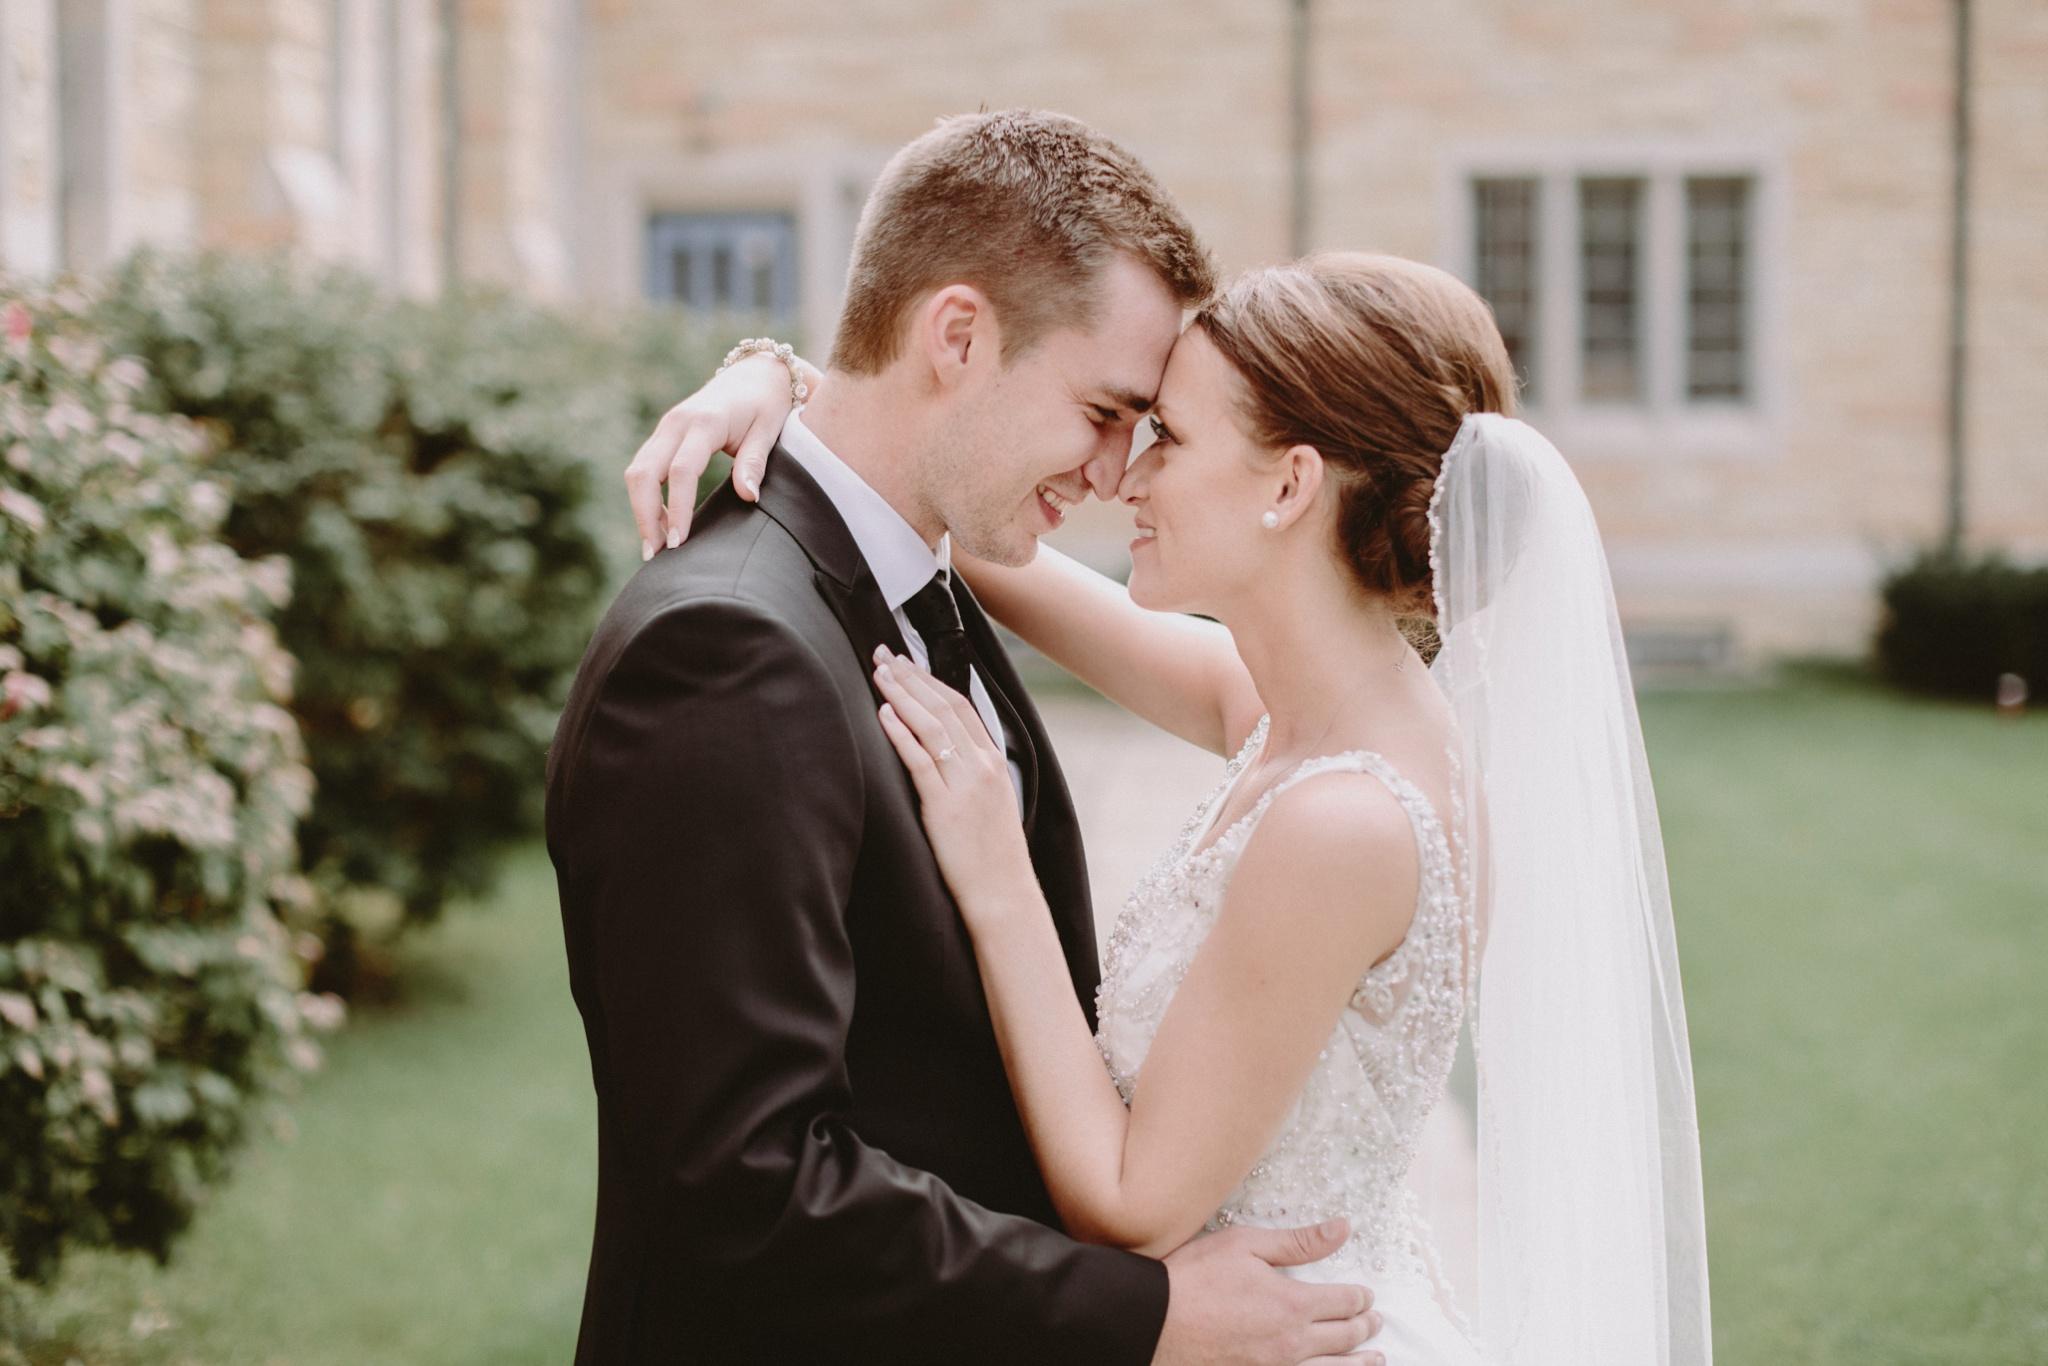 iowa-venue-fort-dodge-church-ceremony-bride-groom-portraits-white-veil-sleeveless-dress